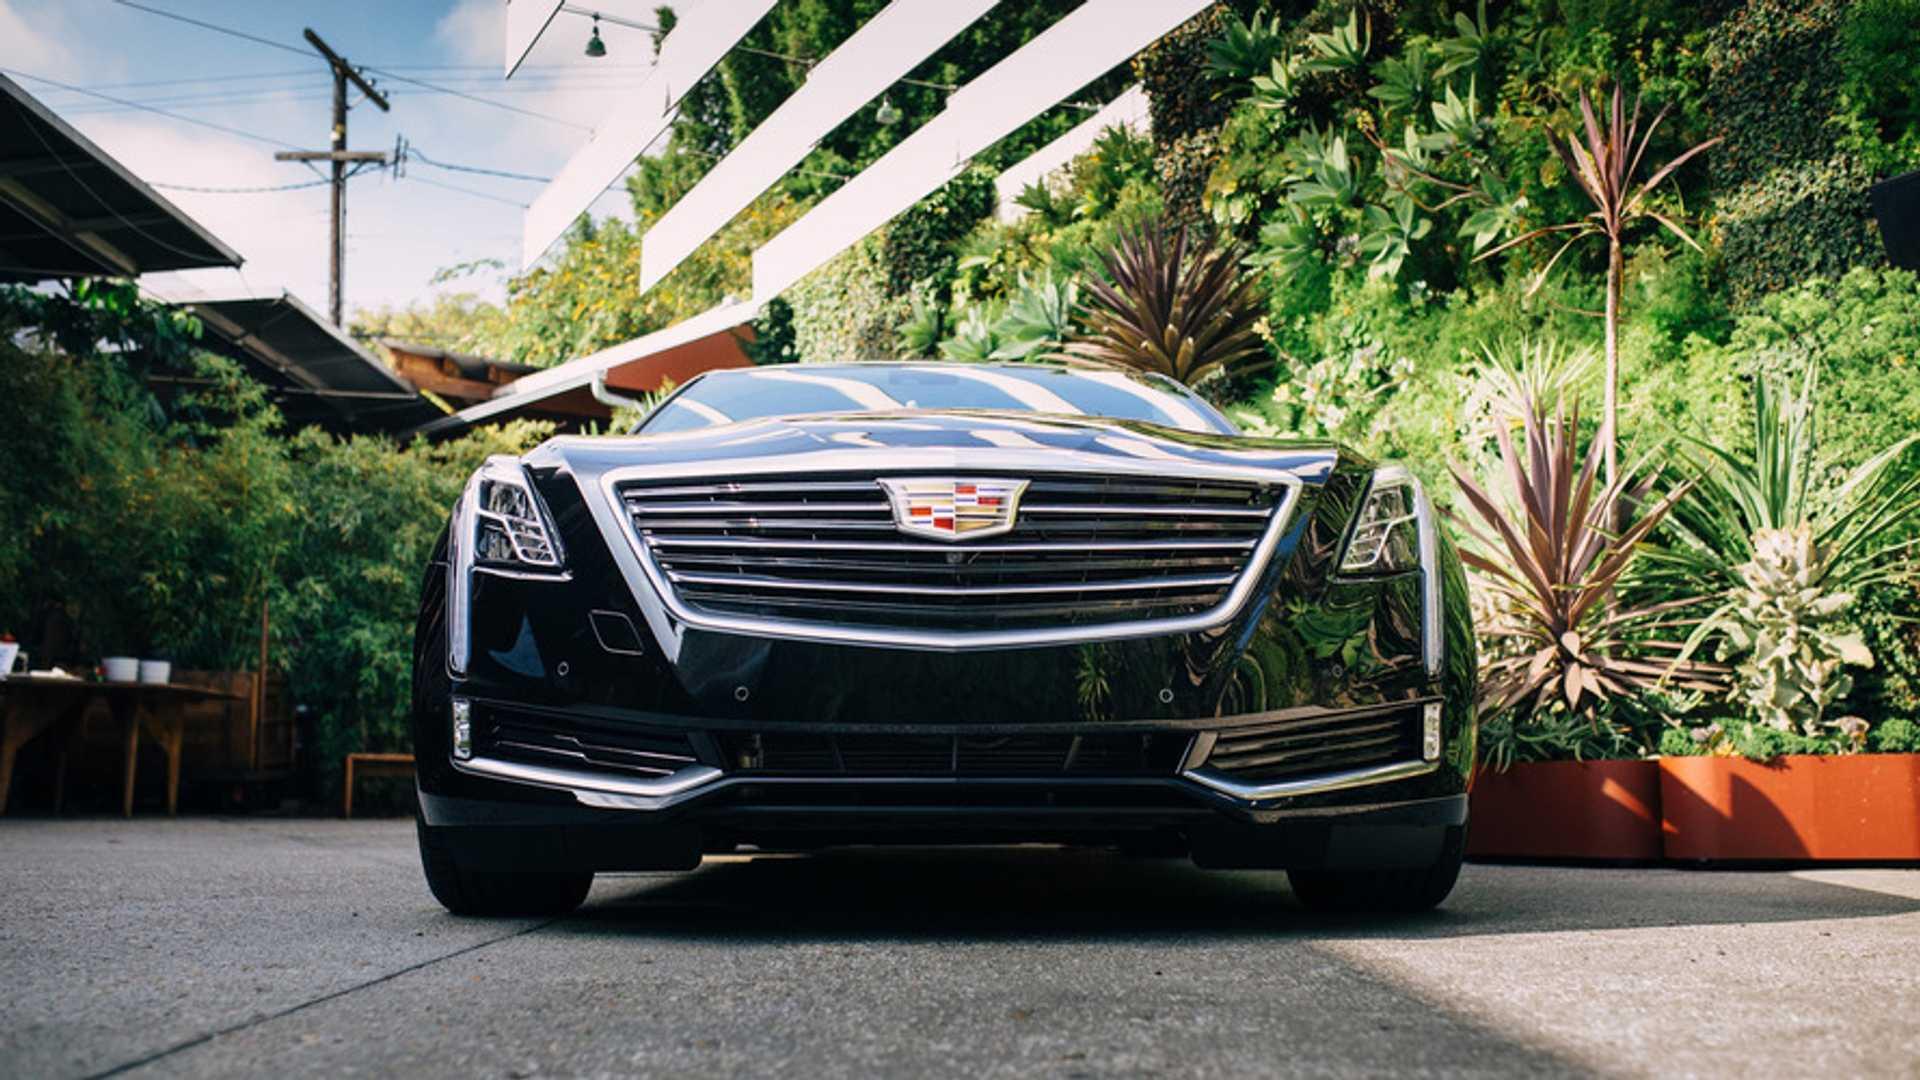 Xts Vs Cts >> Cadillac Chief Confirms Ct5 Will Replace Cts And Xts Sedans